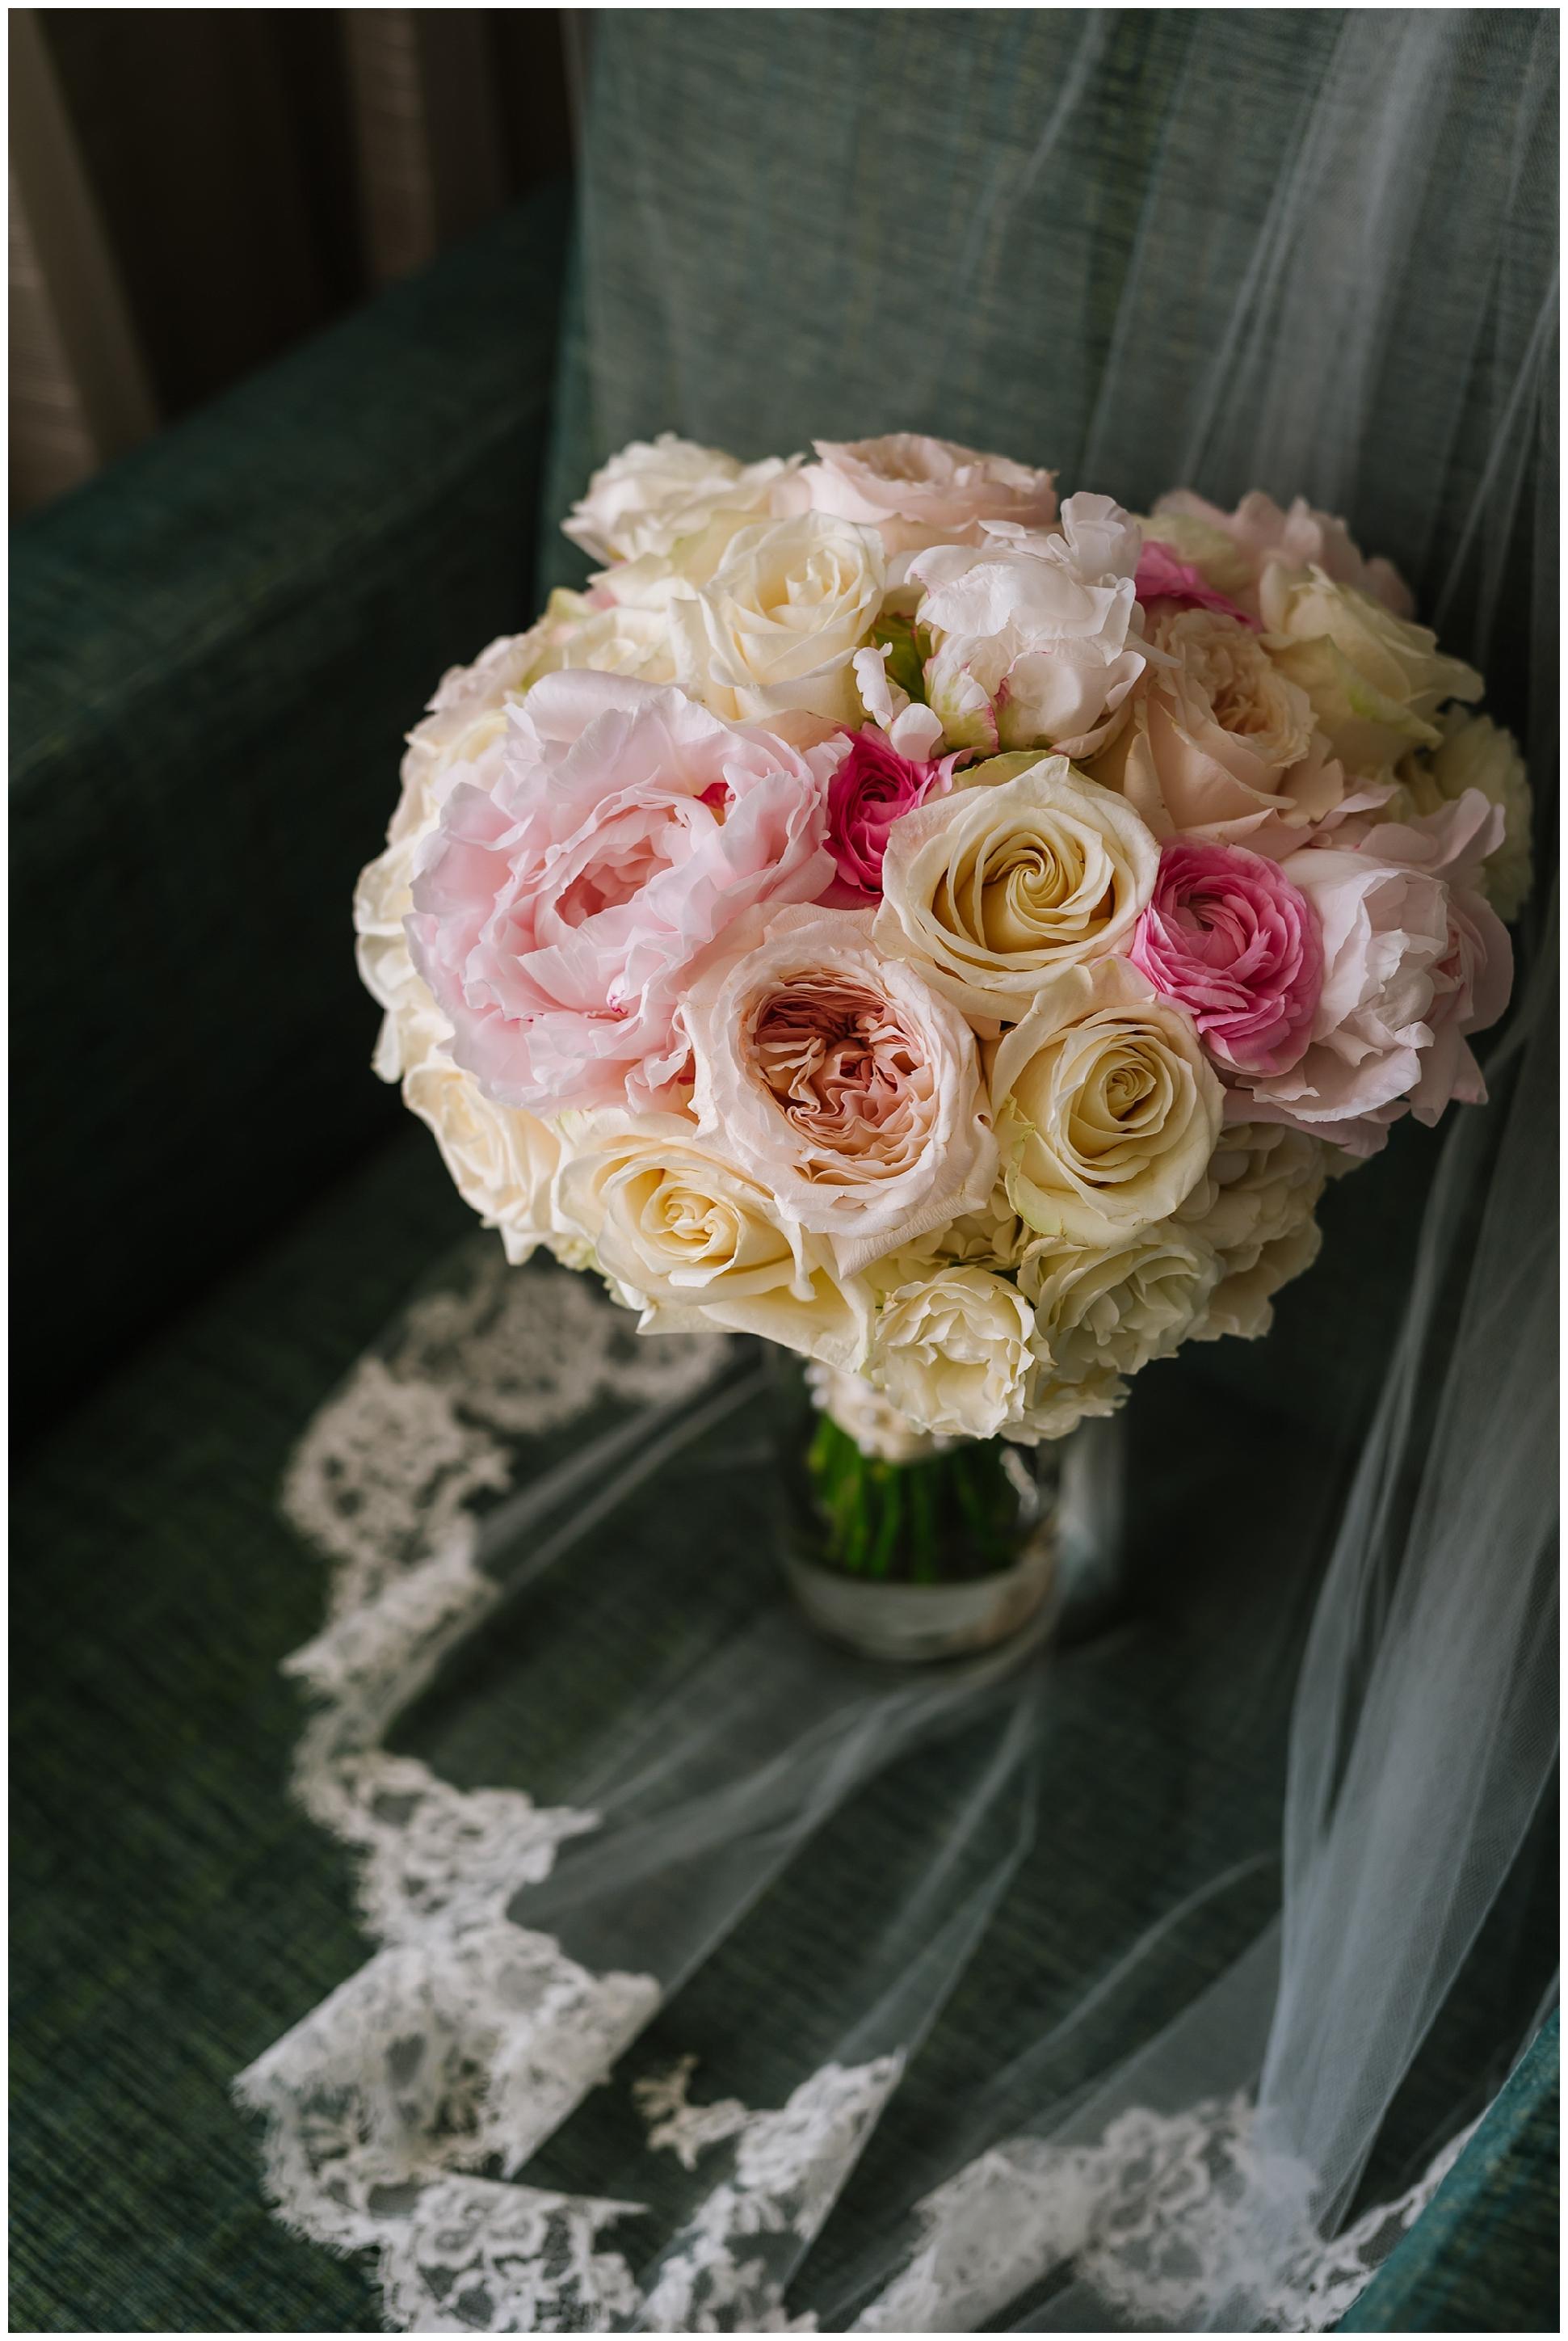 Sarasota-wedding-photographer-hyatt-regency-blush_0007.jpg